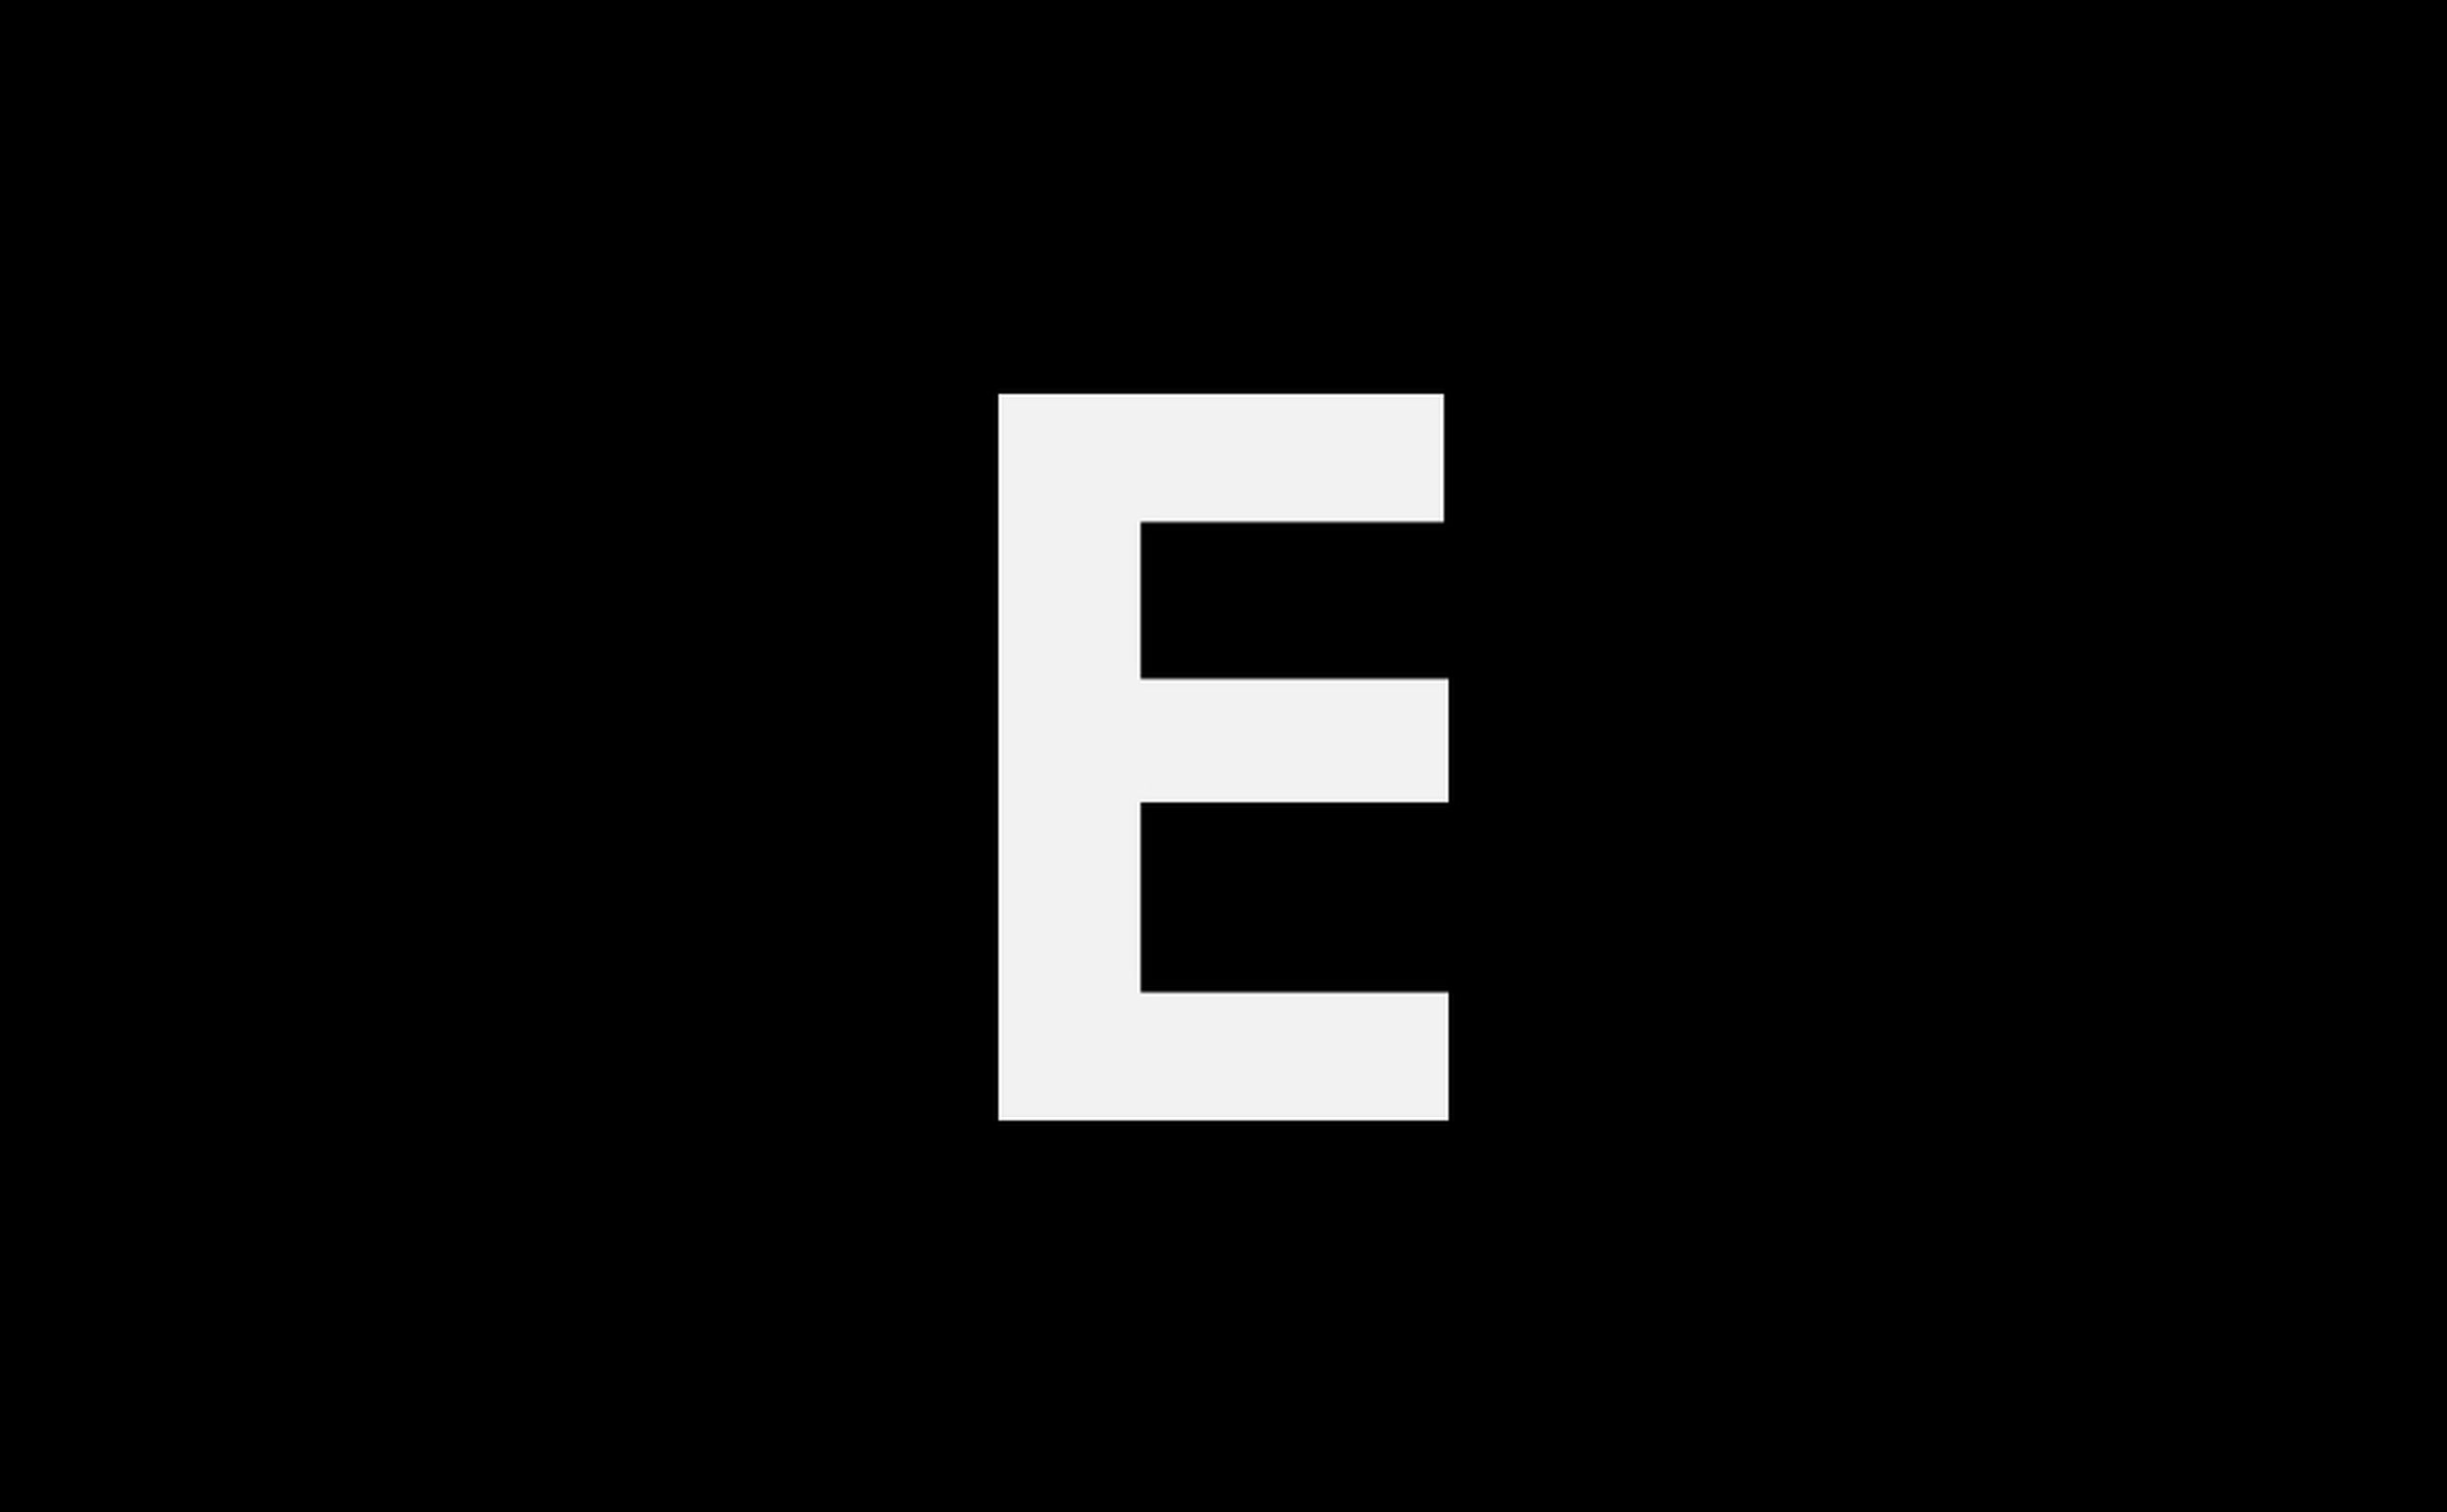 ILLUMINATED CORRIDOR IN MODERN BUILDING